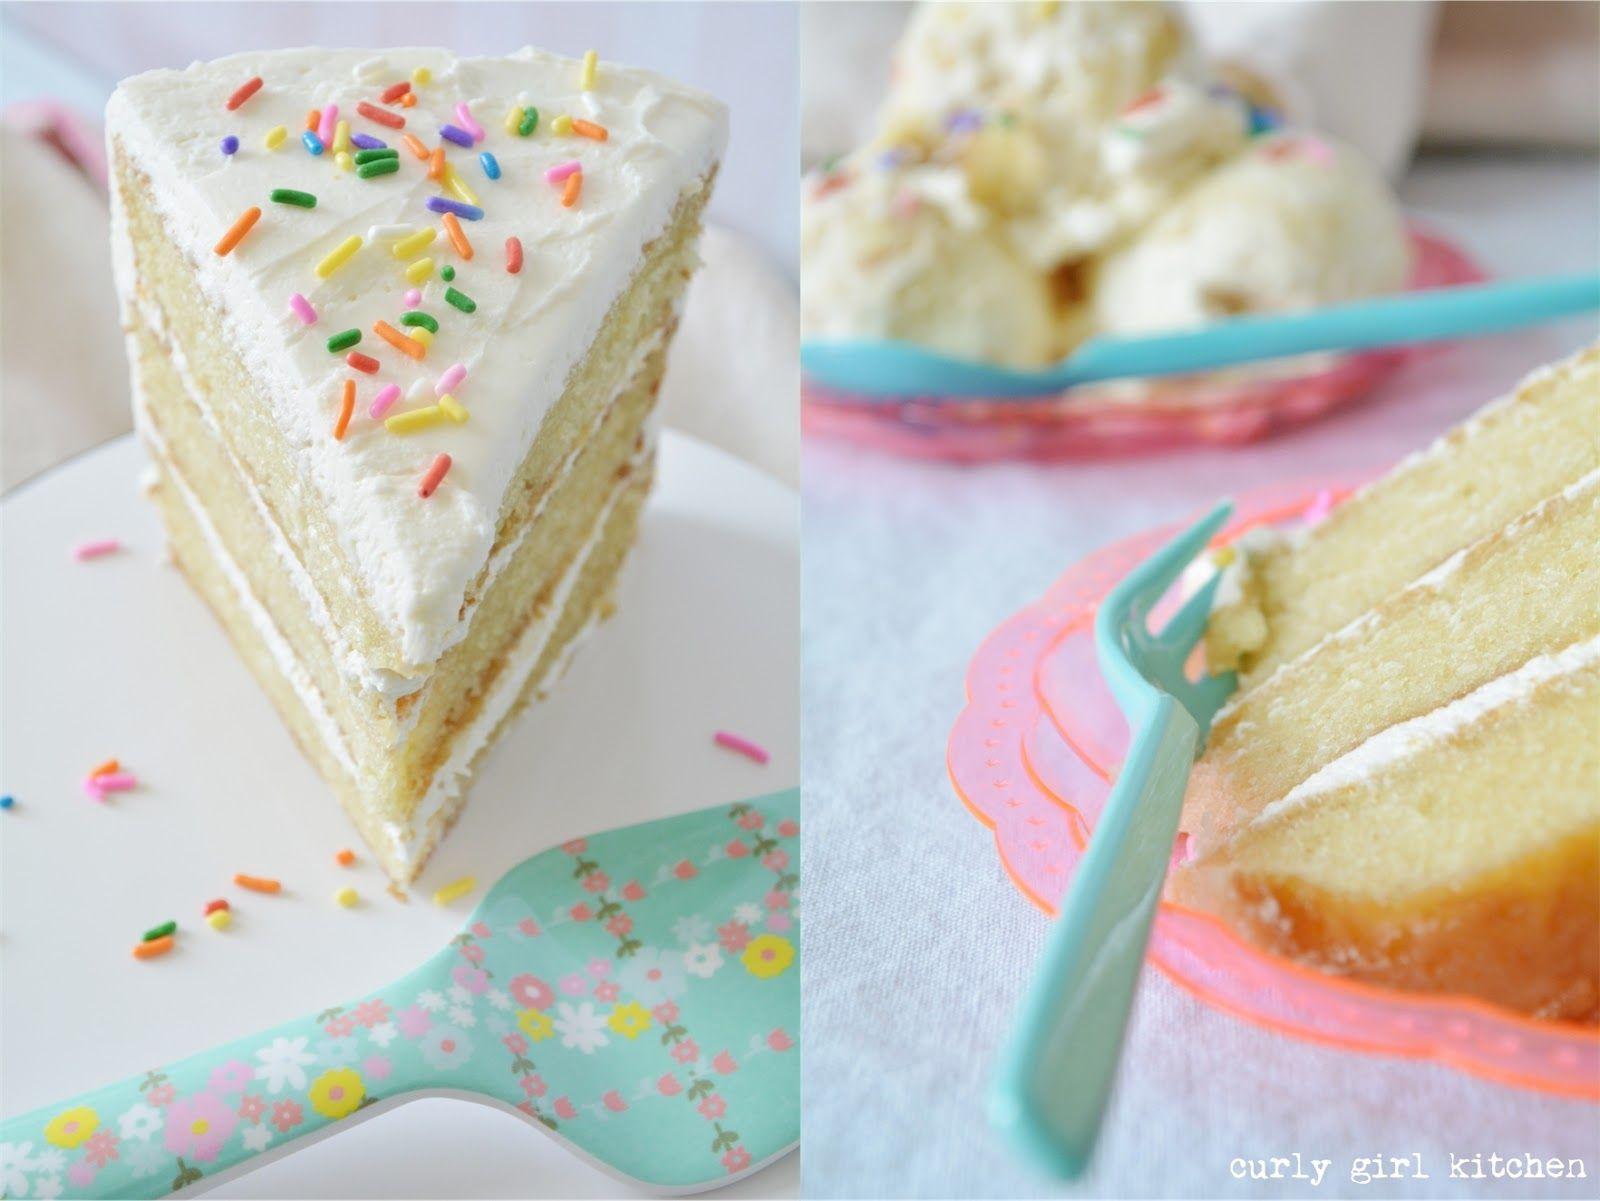 Birthday cake ice cream curly girl kitchen in 2020